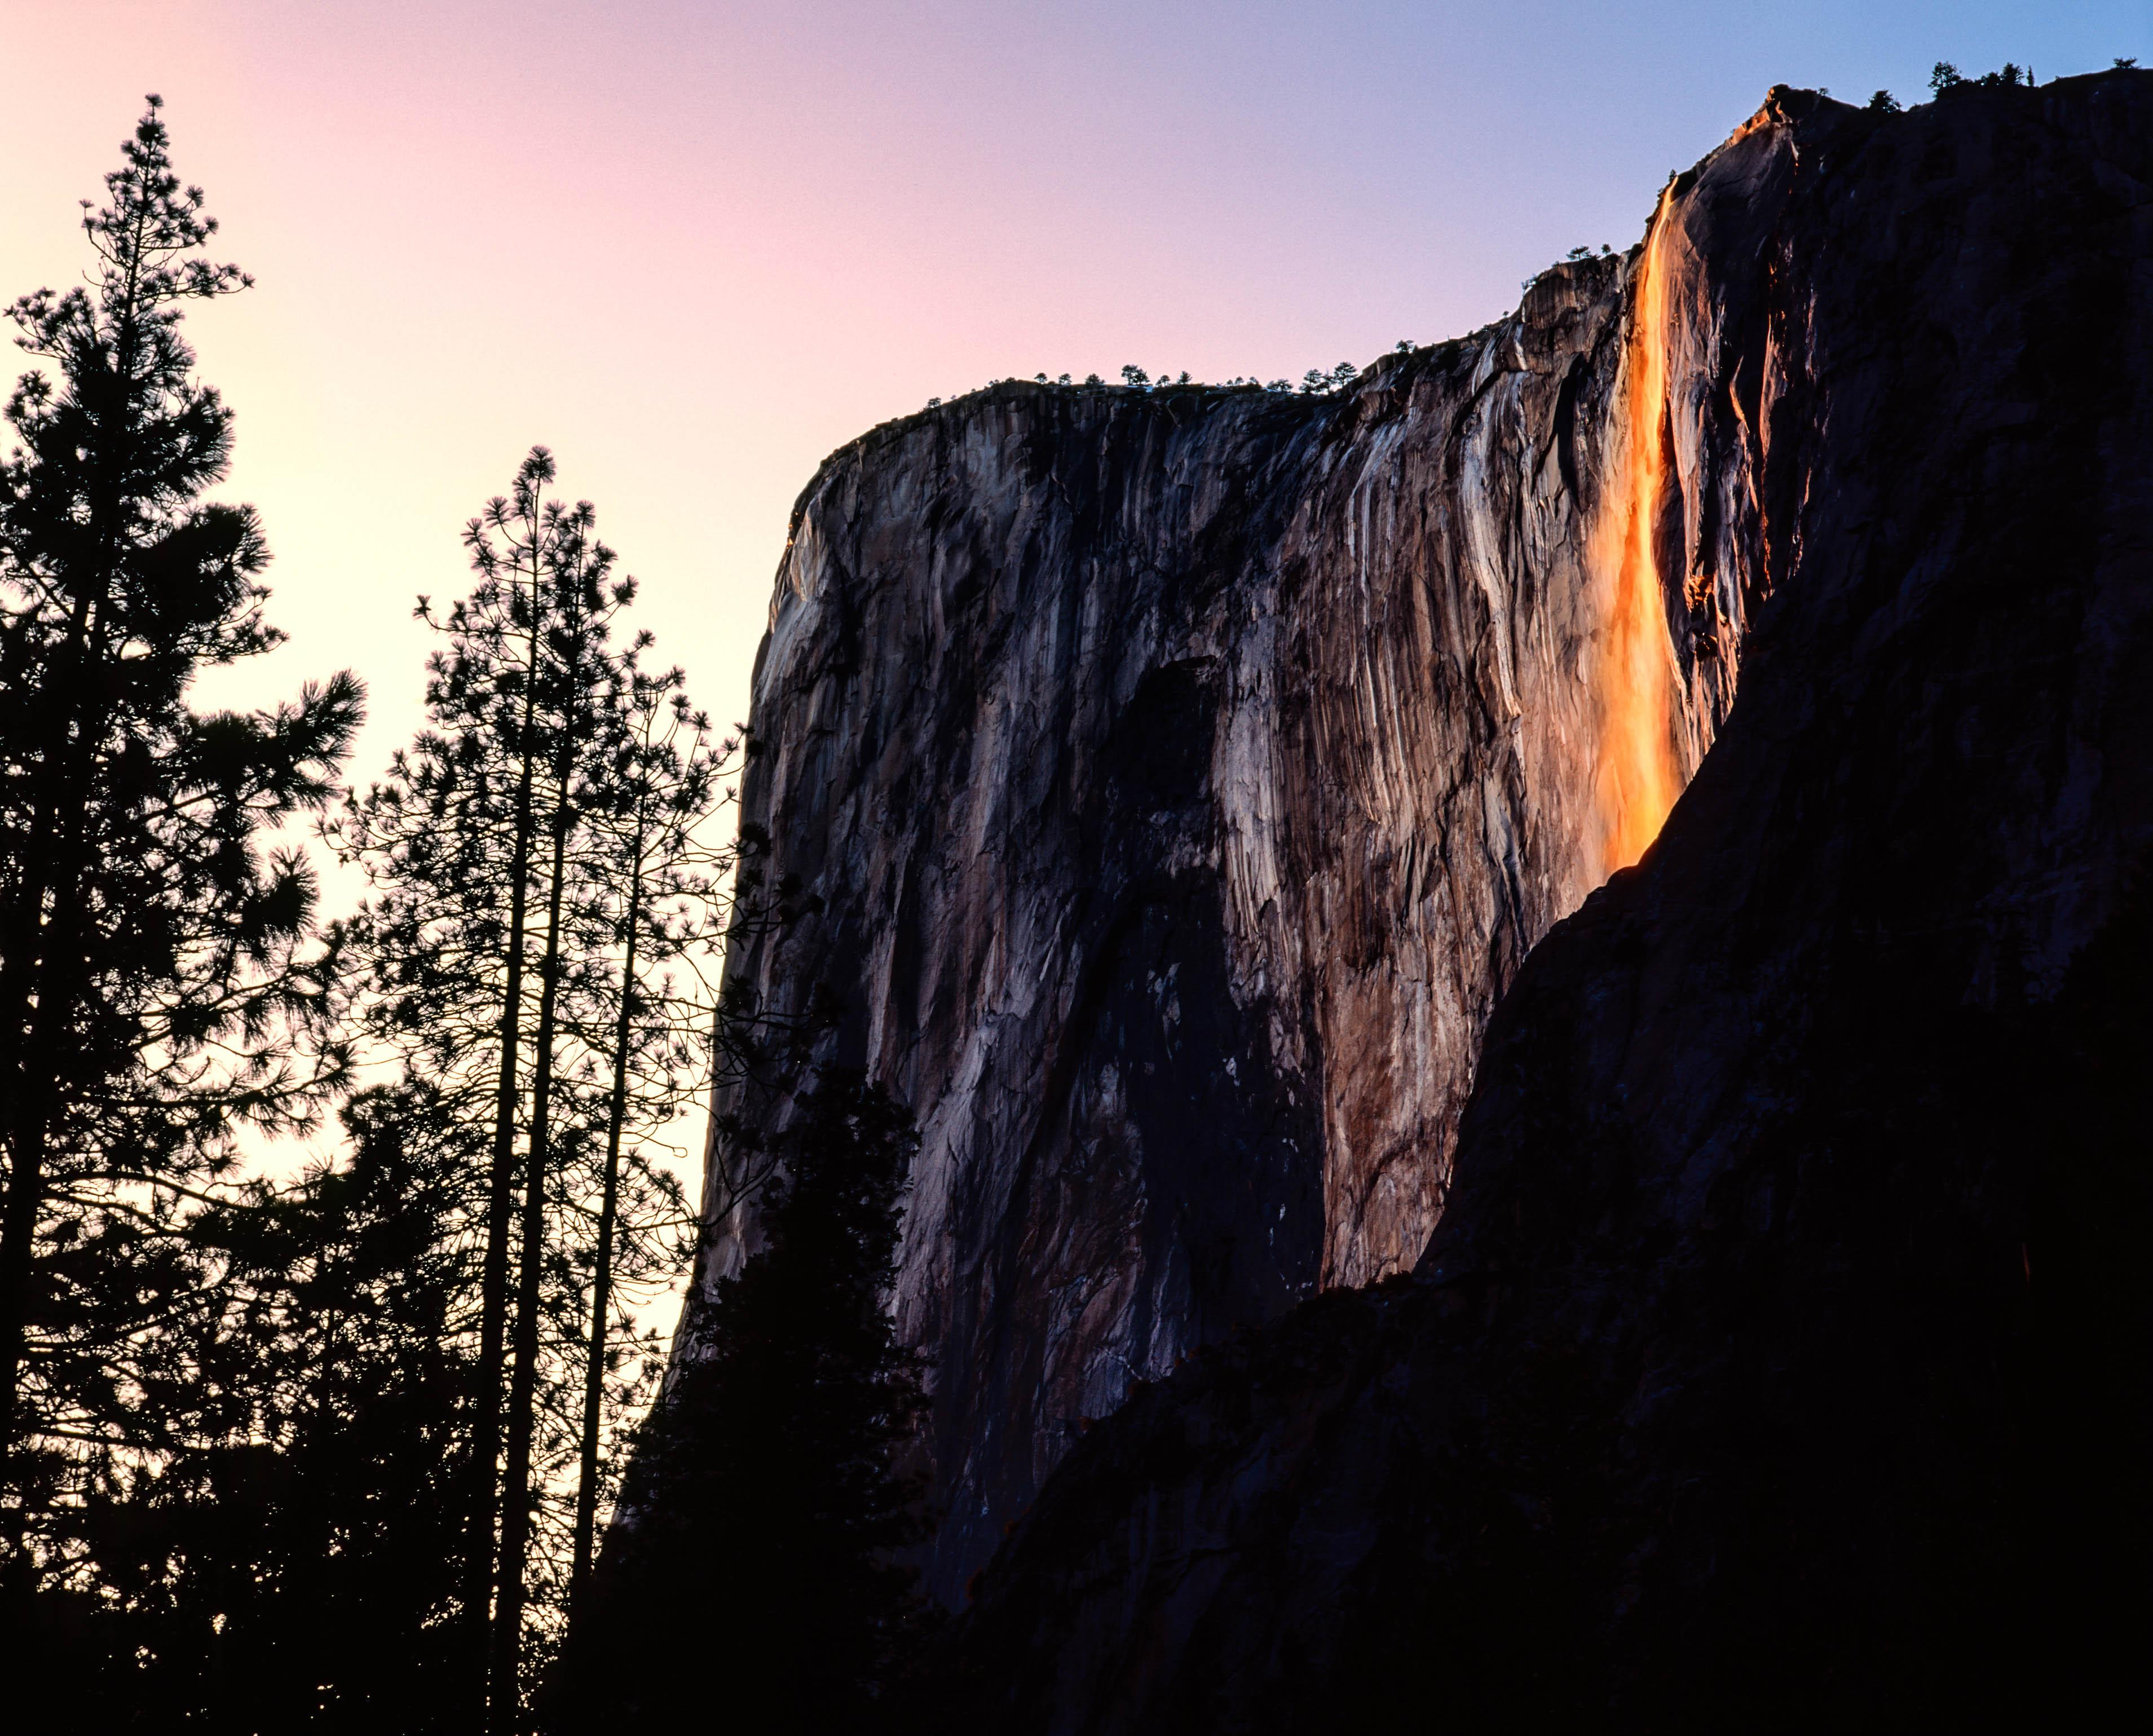 Fire Falls Horstail Falls Yosemite Park USA